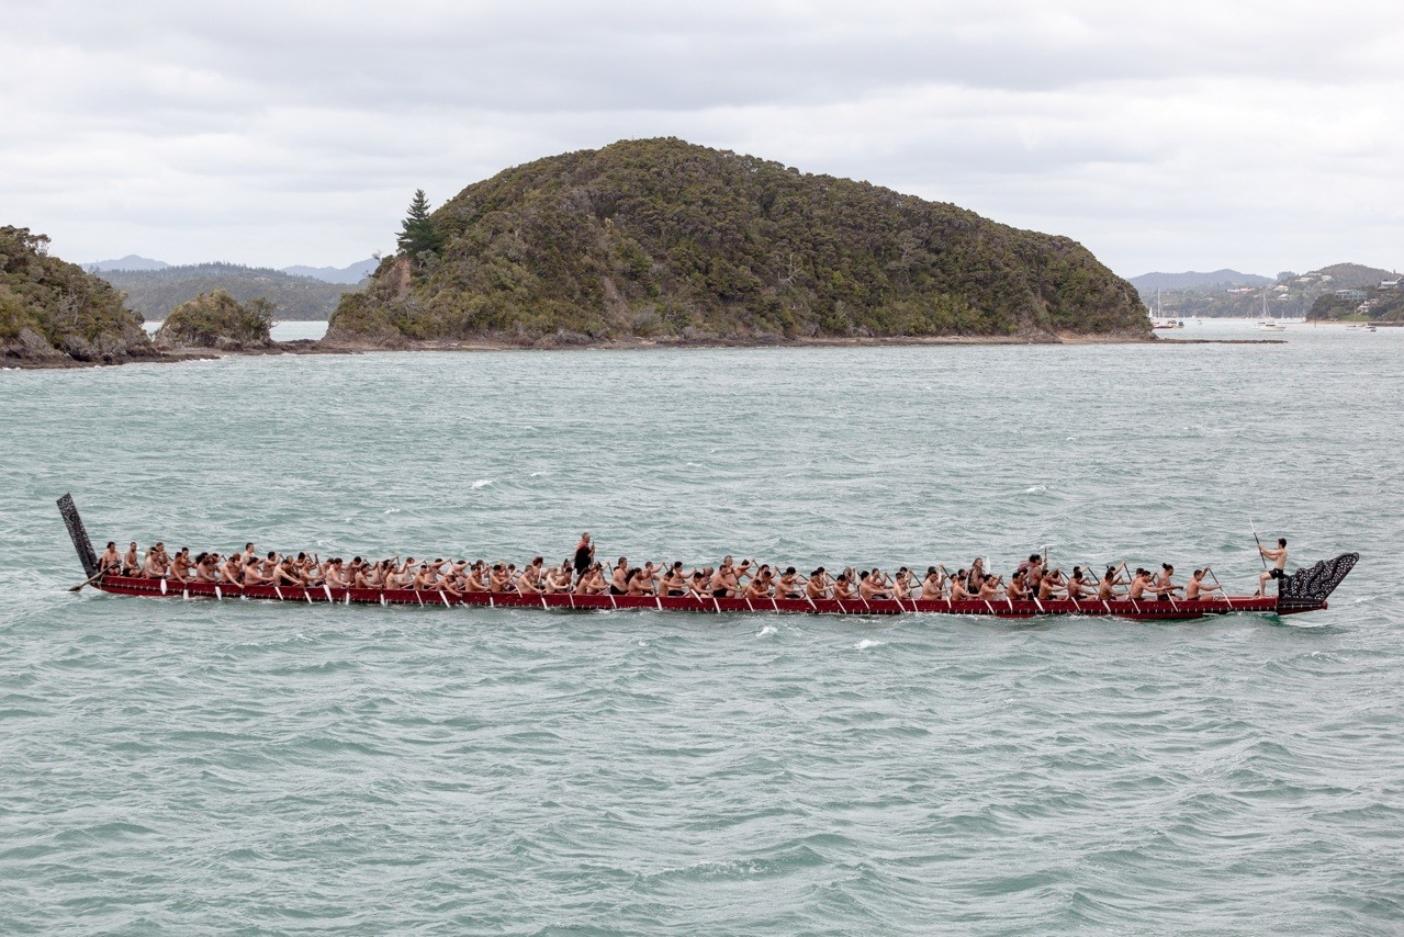 The ceremonial war canoe, Ngātokimatawhaorua, with its eighty paddlers, escorted Hikianalia and Hōkūle'a into Waitangi. Photo: John Bilderback